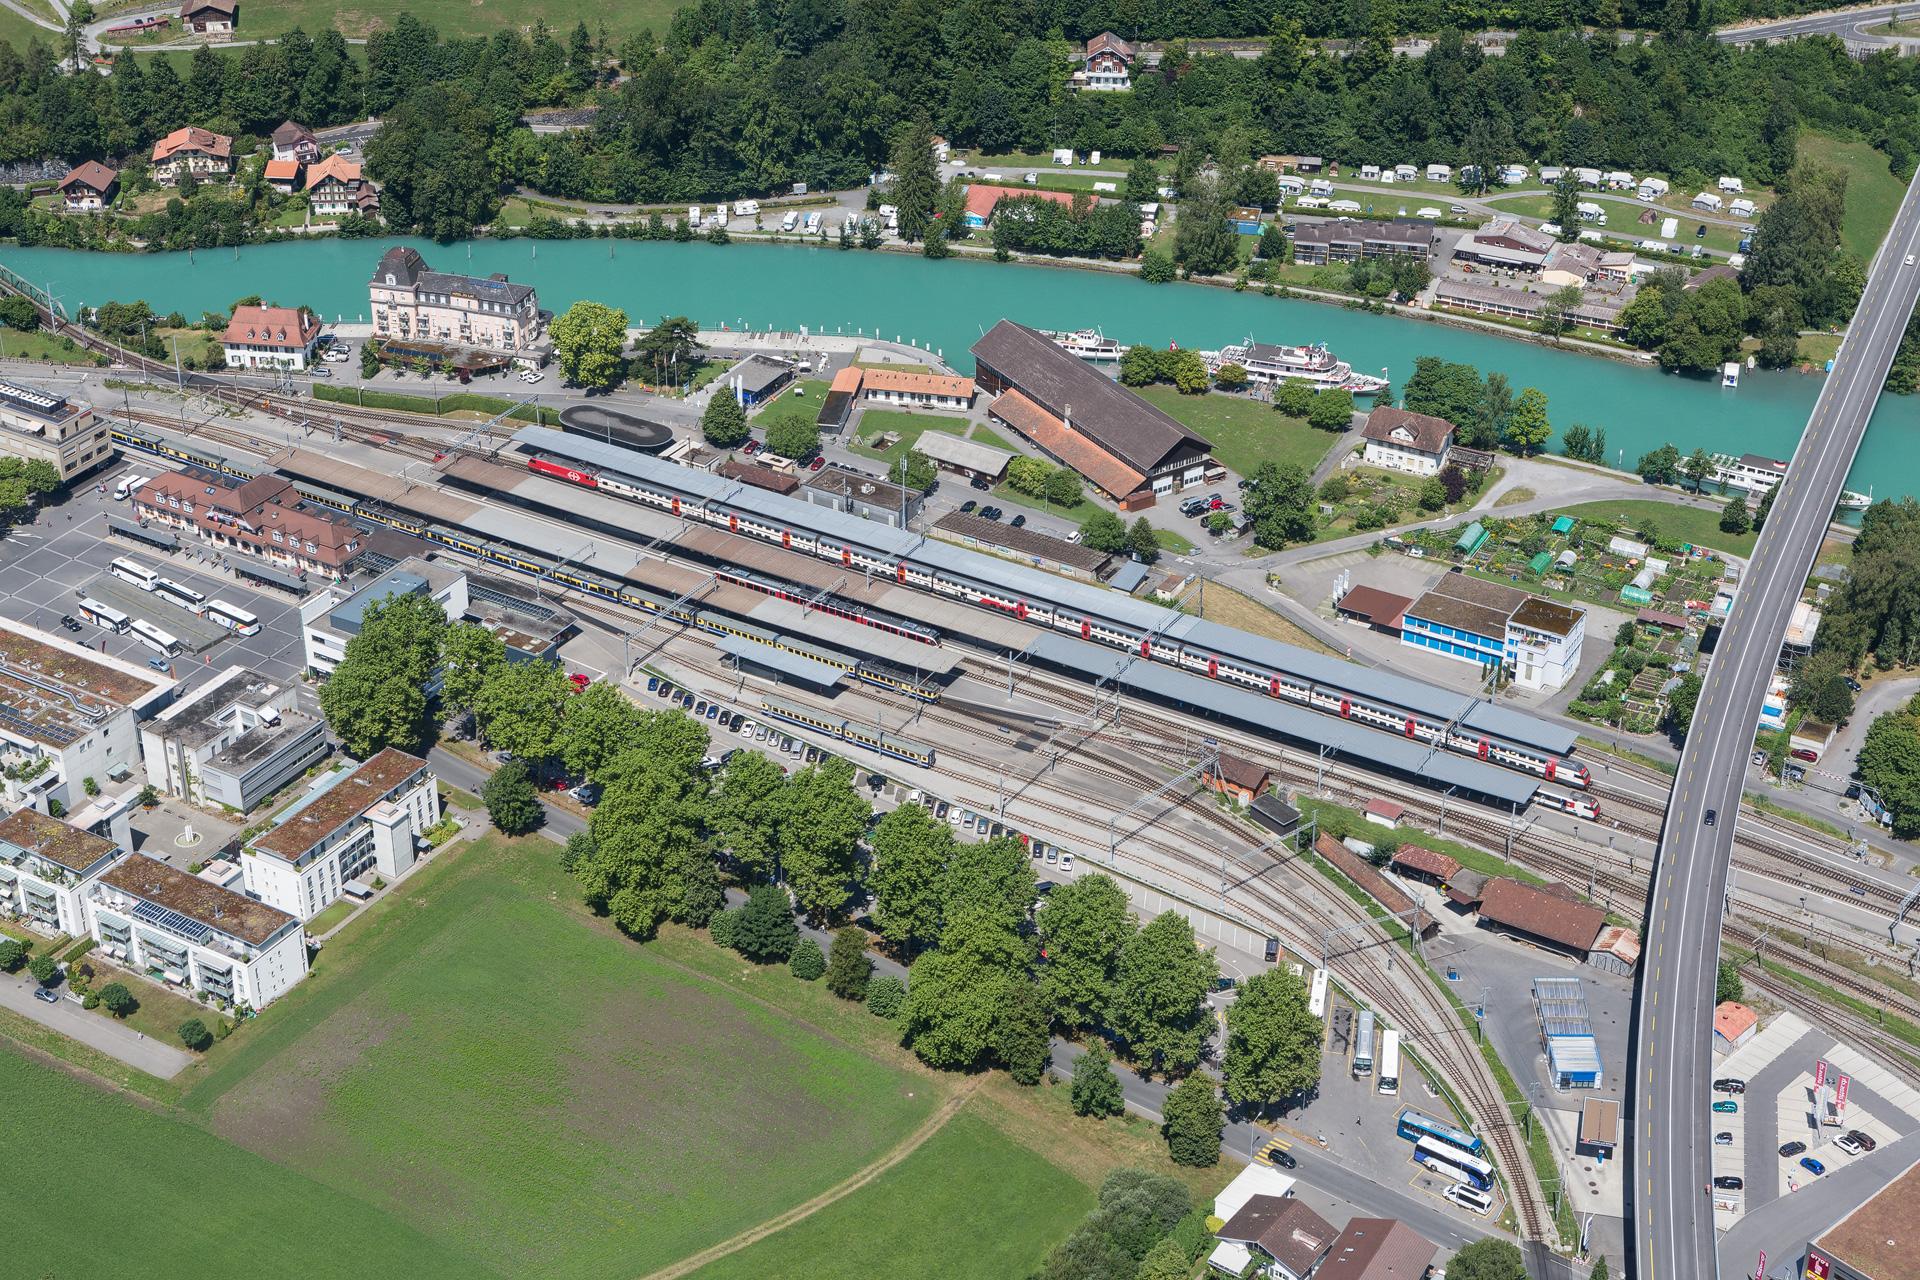 Mamo-Photography-Zepellin-Interlaken-Bahnhof